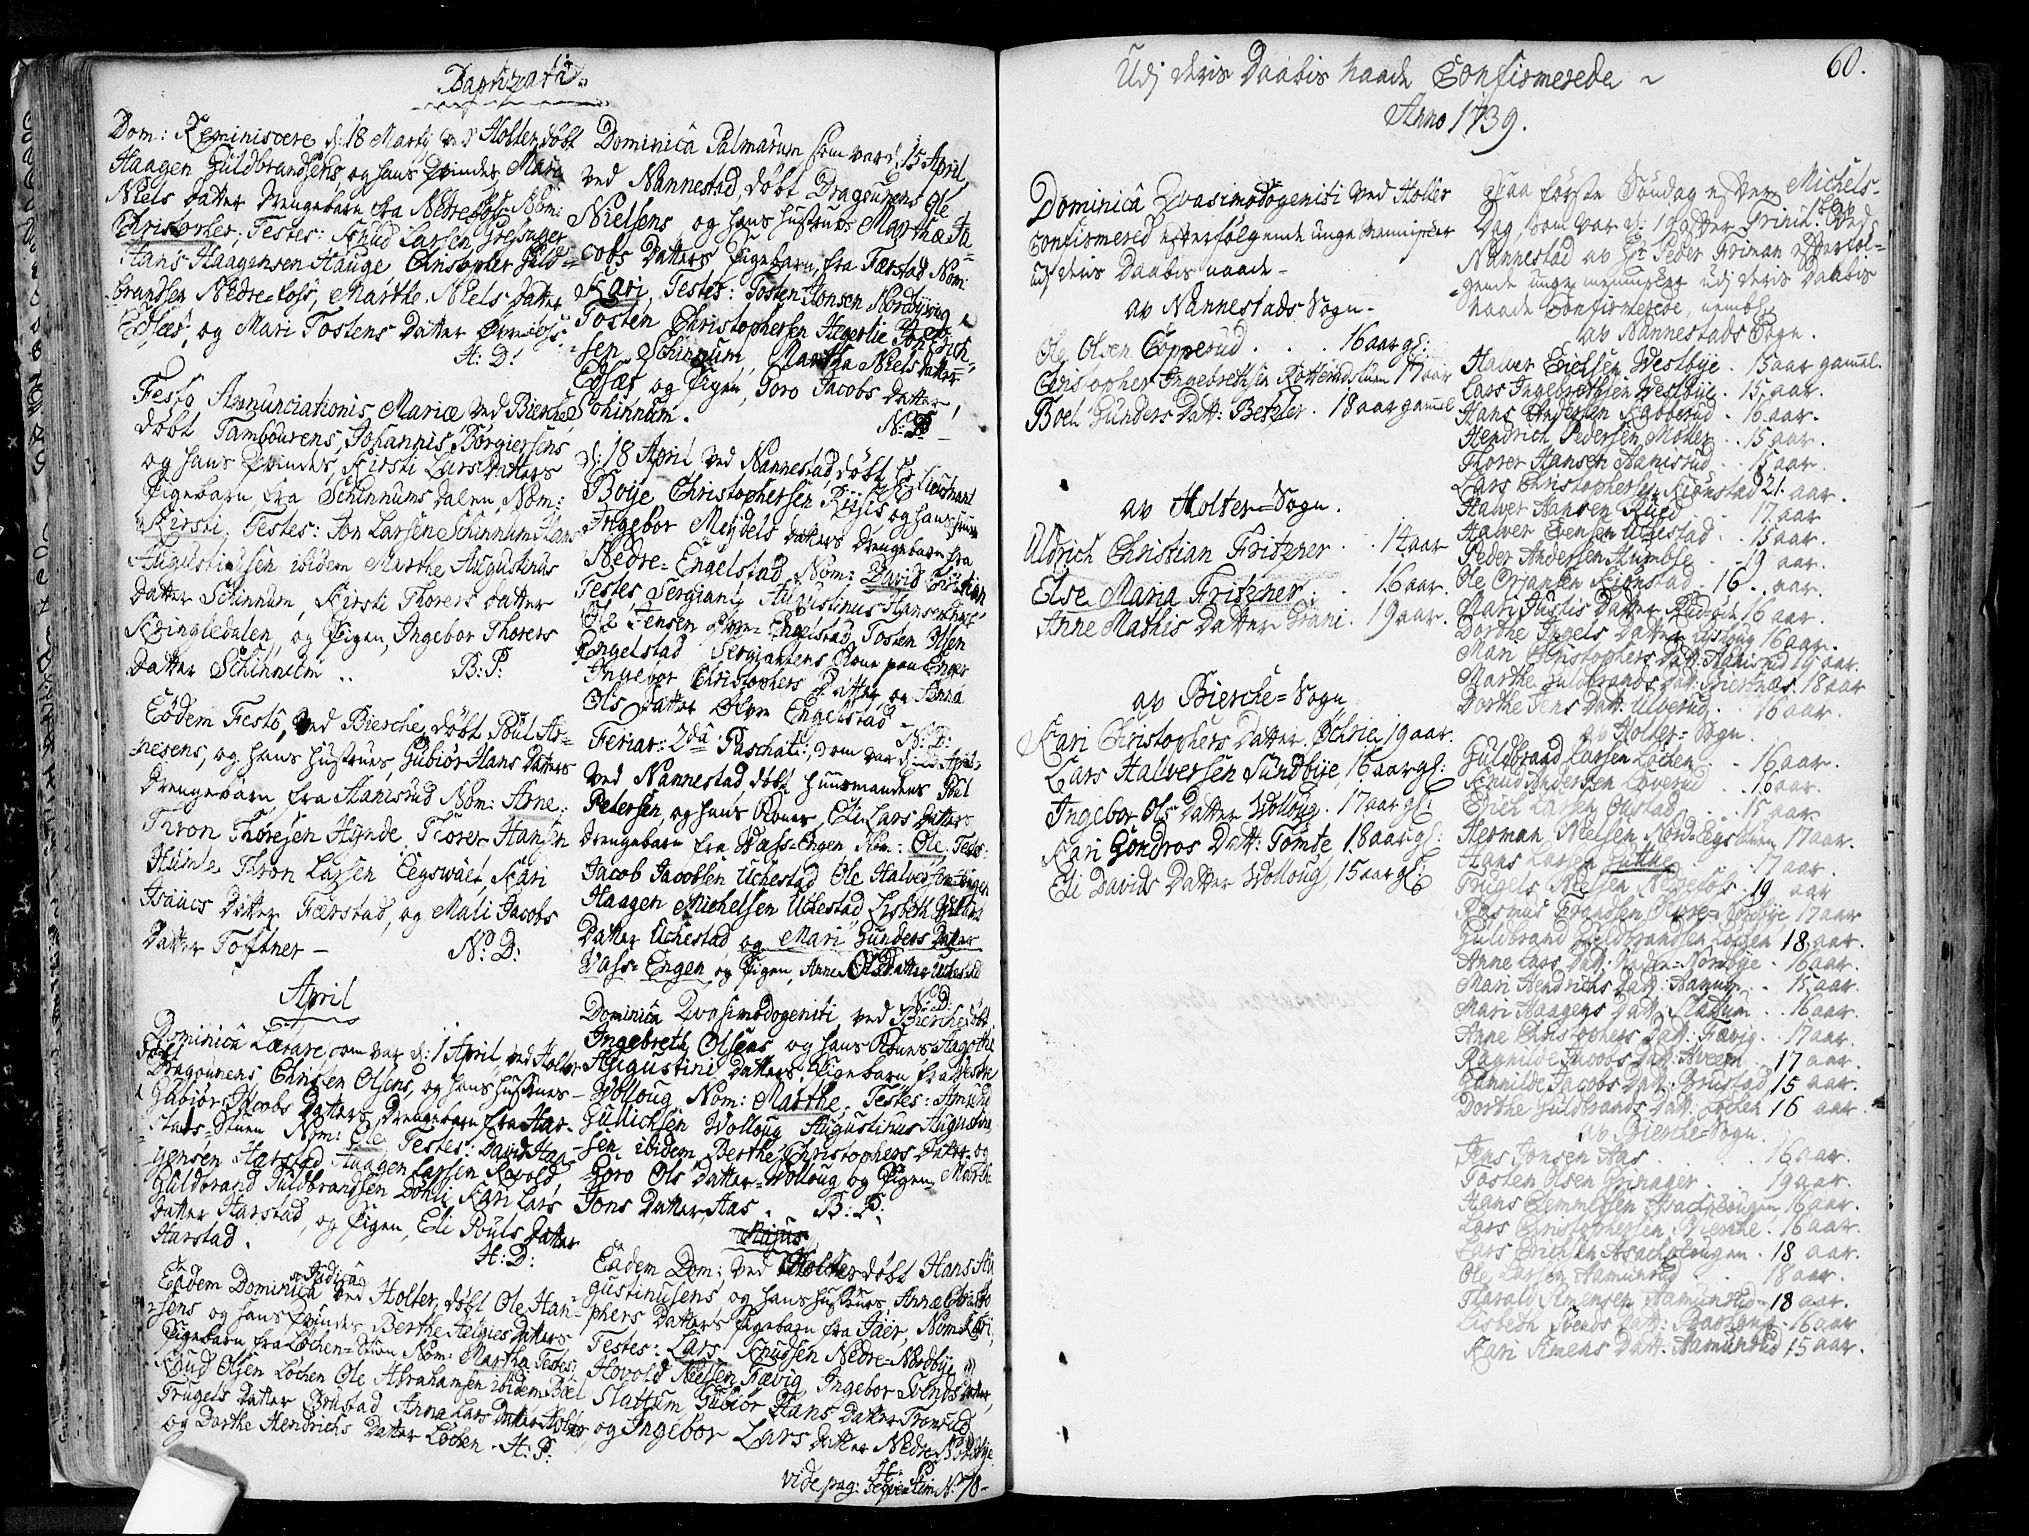 SAO, Nannestad prestekontor Kirkebøker, F/Fa/L0006: Ministerialbok nr. I 6, 1739-1754, s. 60